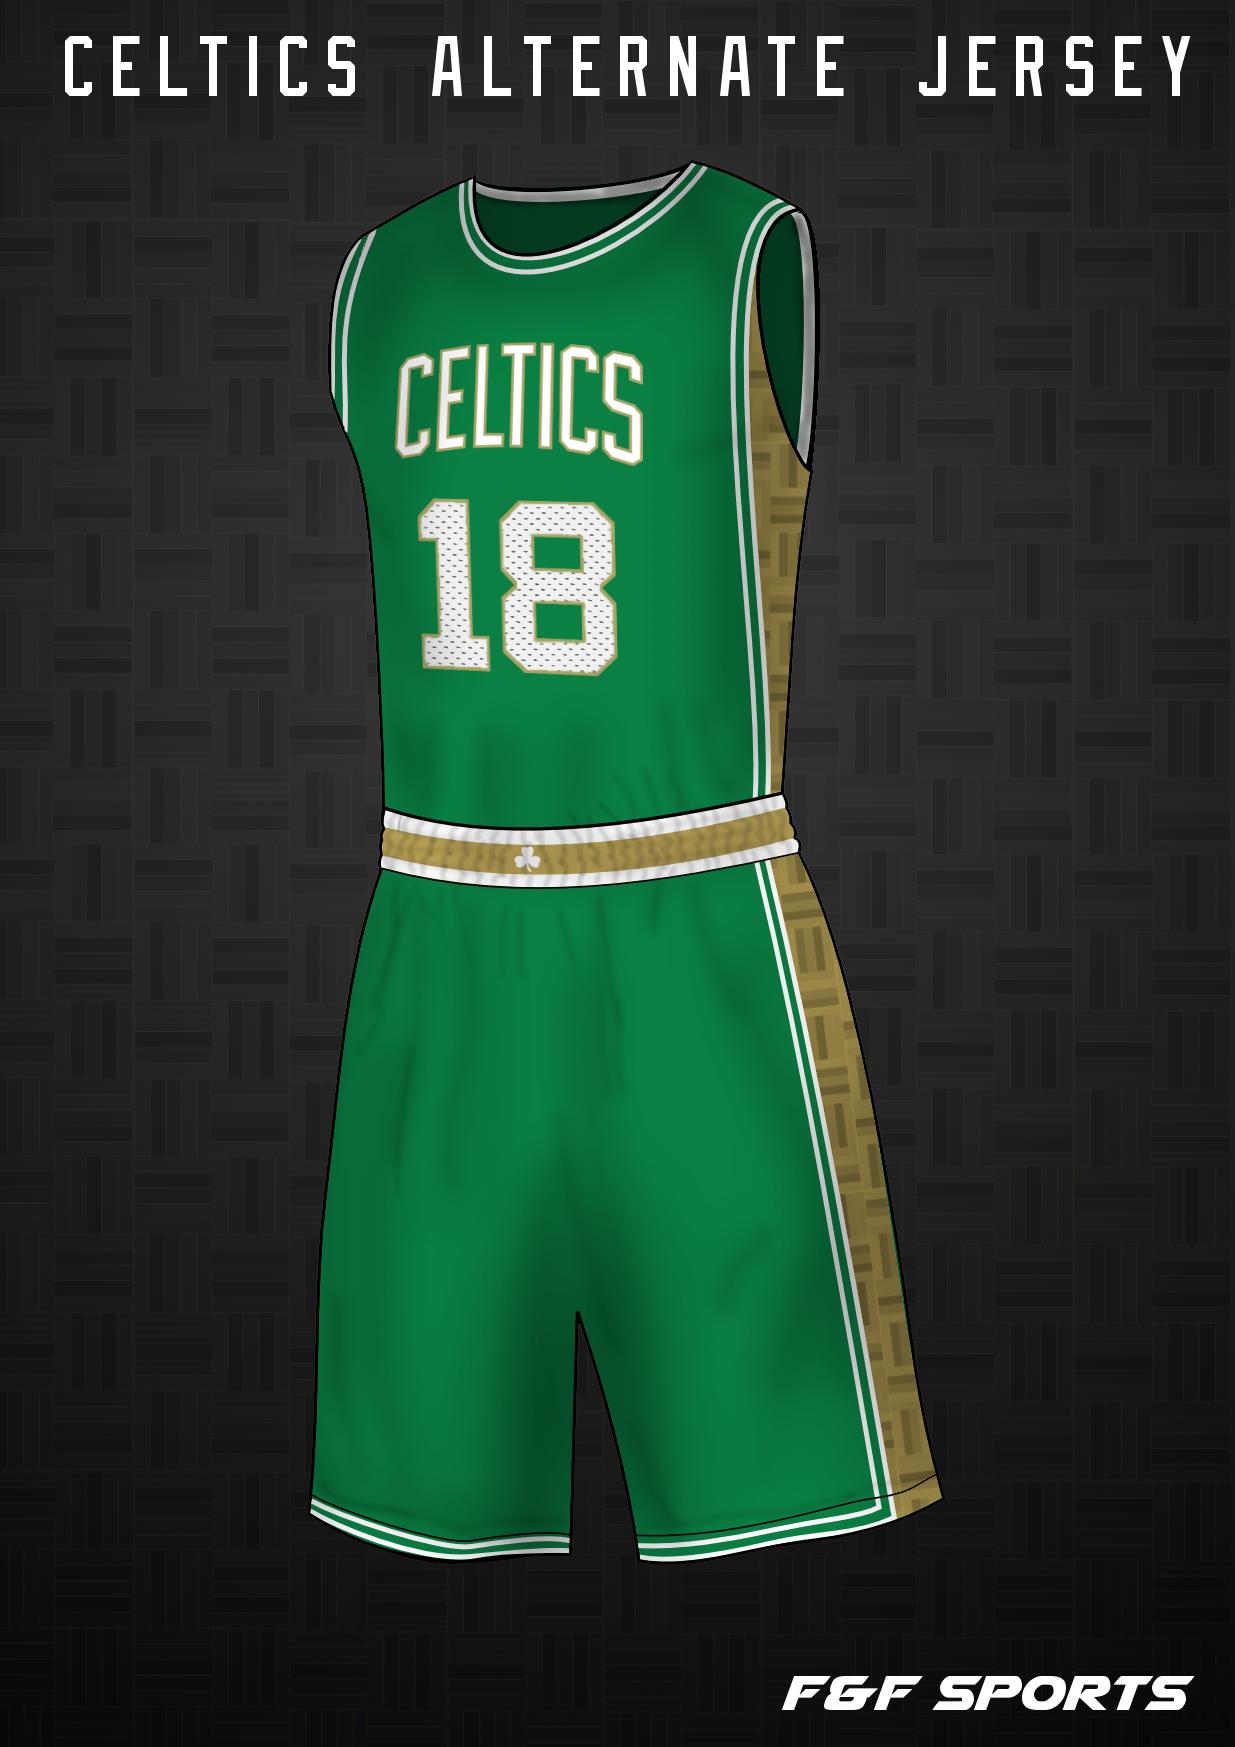 Boston Celtics Alternate Jersey Concept Concepts Chris Creamer S Sports Logos Community Ccslc Sportslogos Net Forums